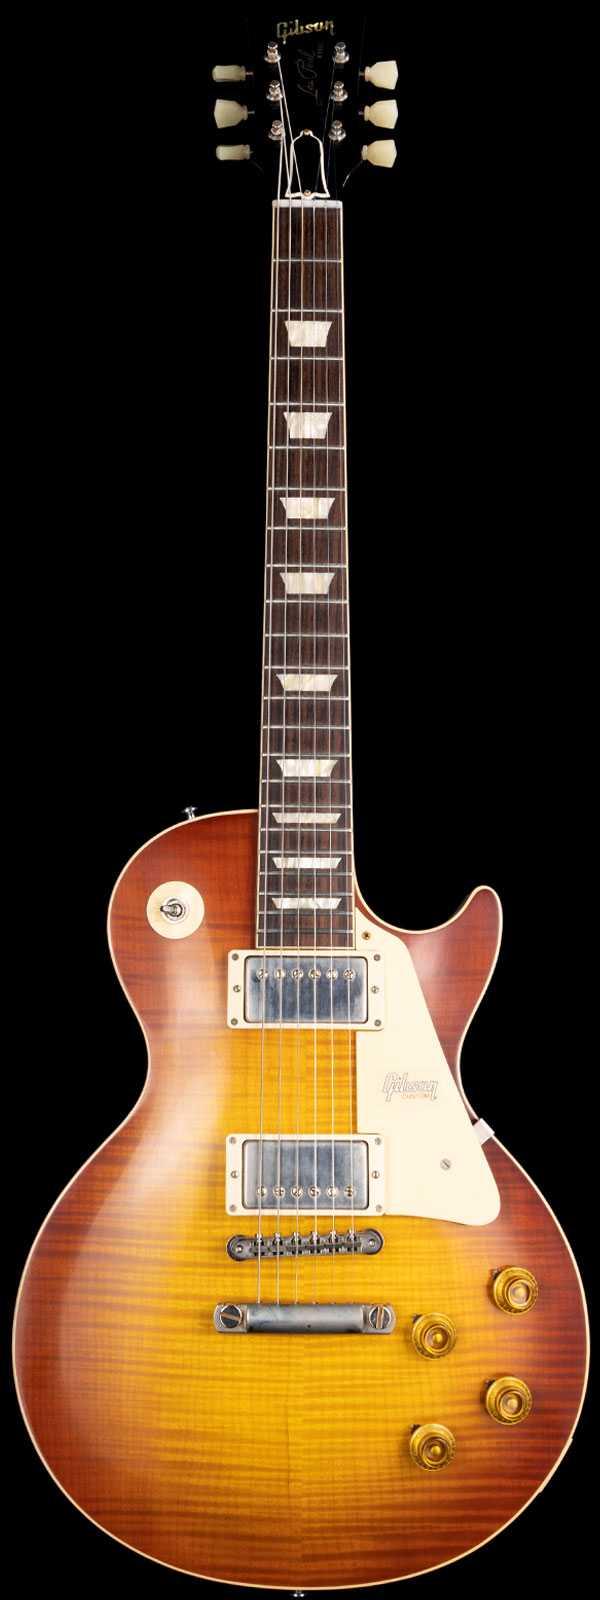 Gibson Custom Shop 60th Anniversary 1959 Les Paul Standard VOS Sunrise Tea Burst